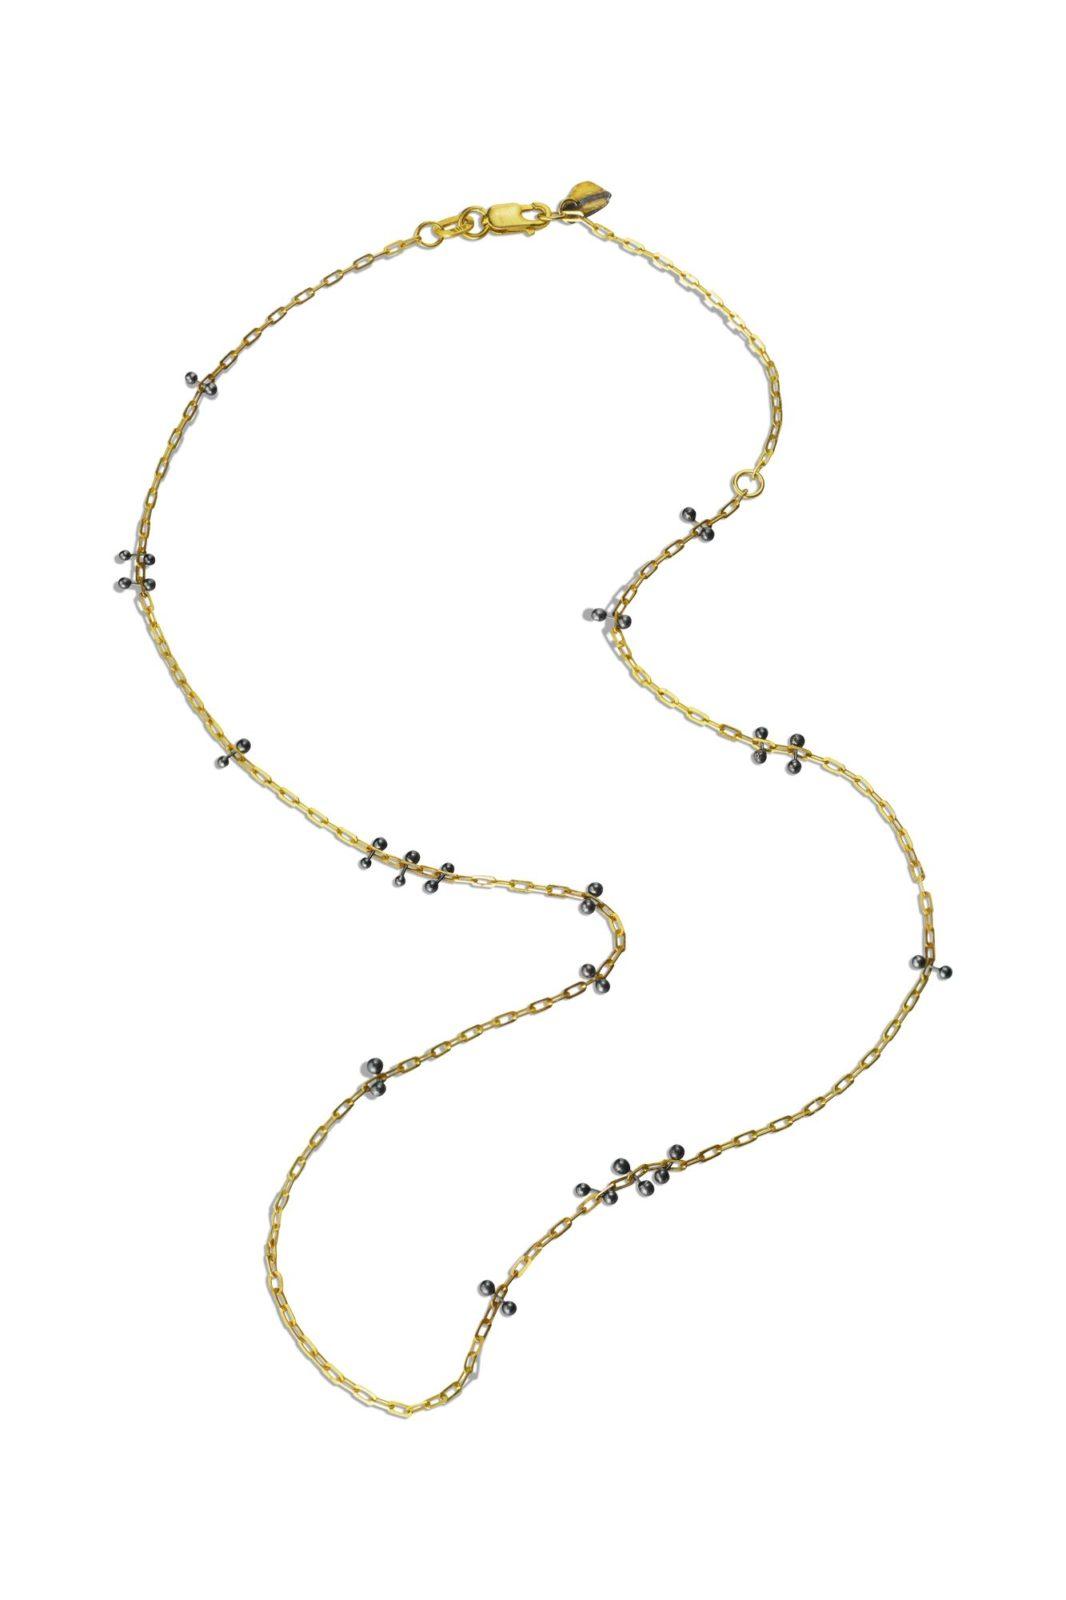 lisa jane grant mokume mixed metal jewellery jewelry gold 14k 18k Yellow gold contemporary necklace organic Maine handmade unique jewellery oxidized oxidised